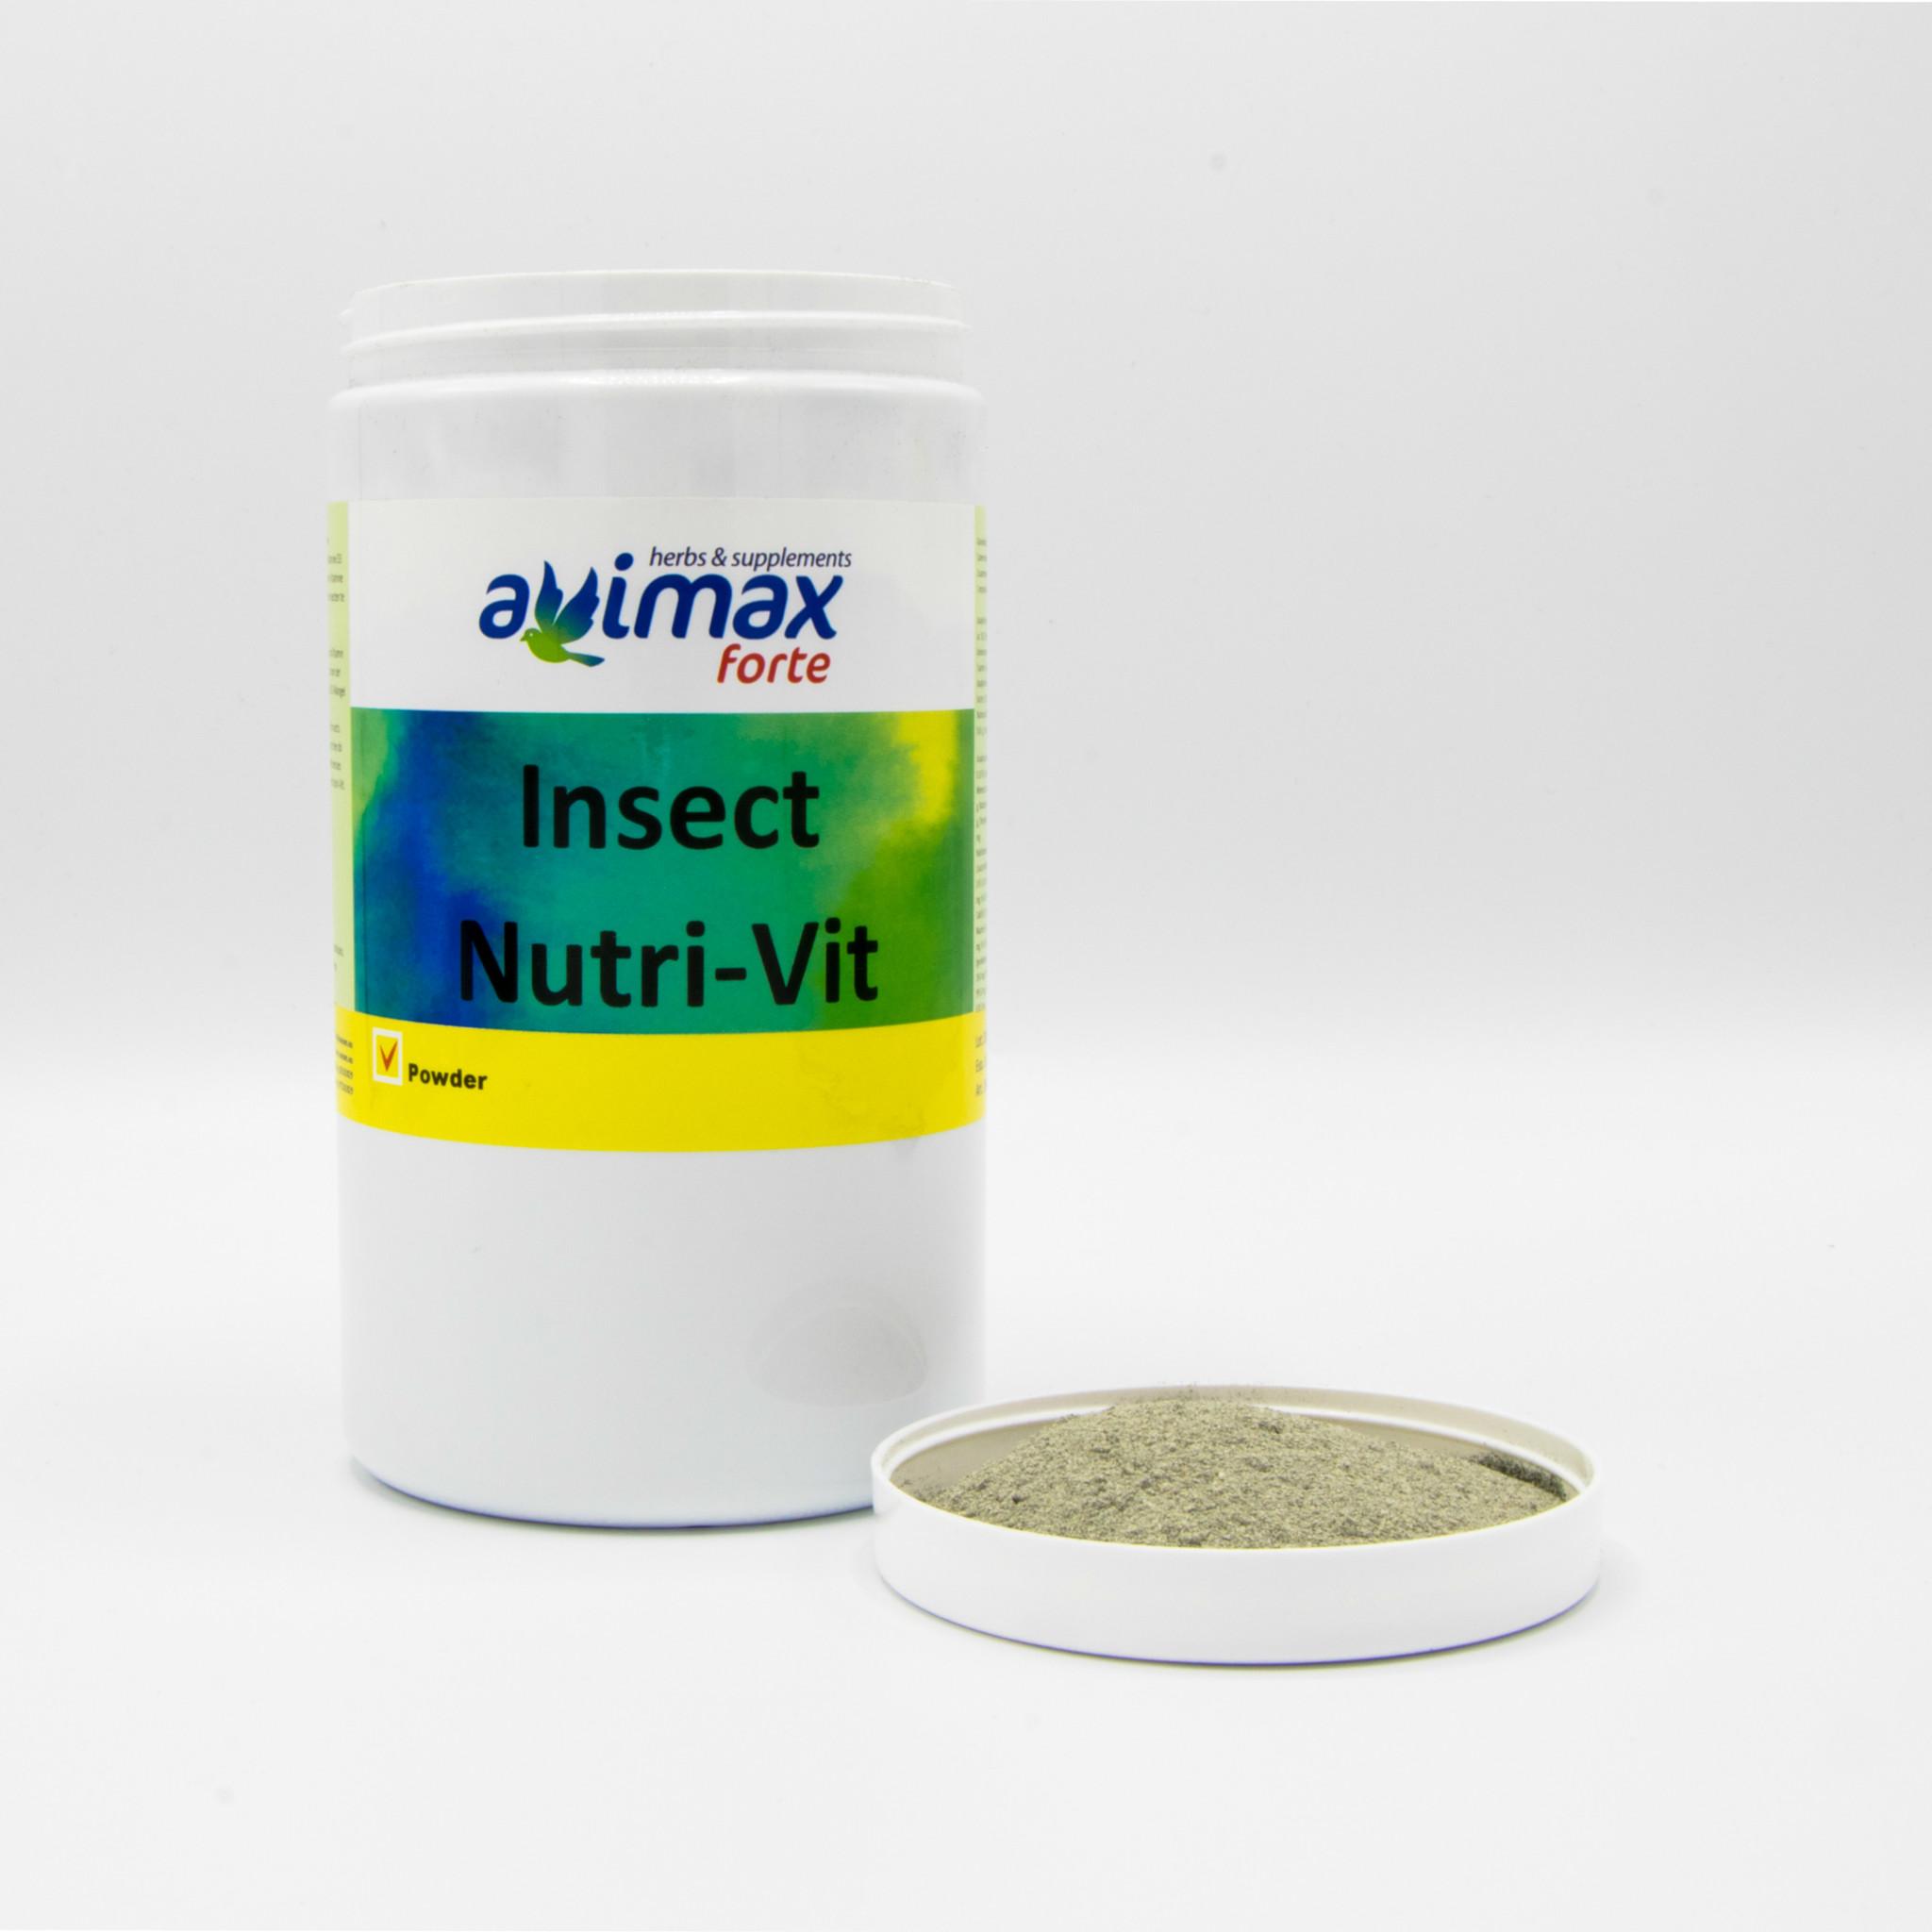 AviMax Forte AviMax Forte Insect Nutri-Vit